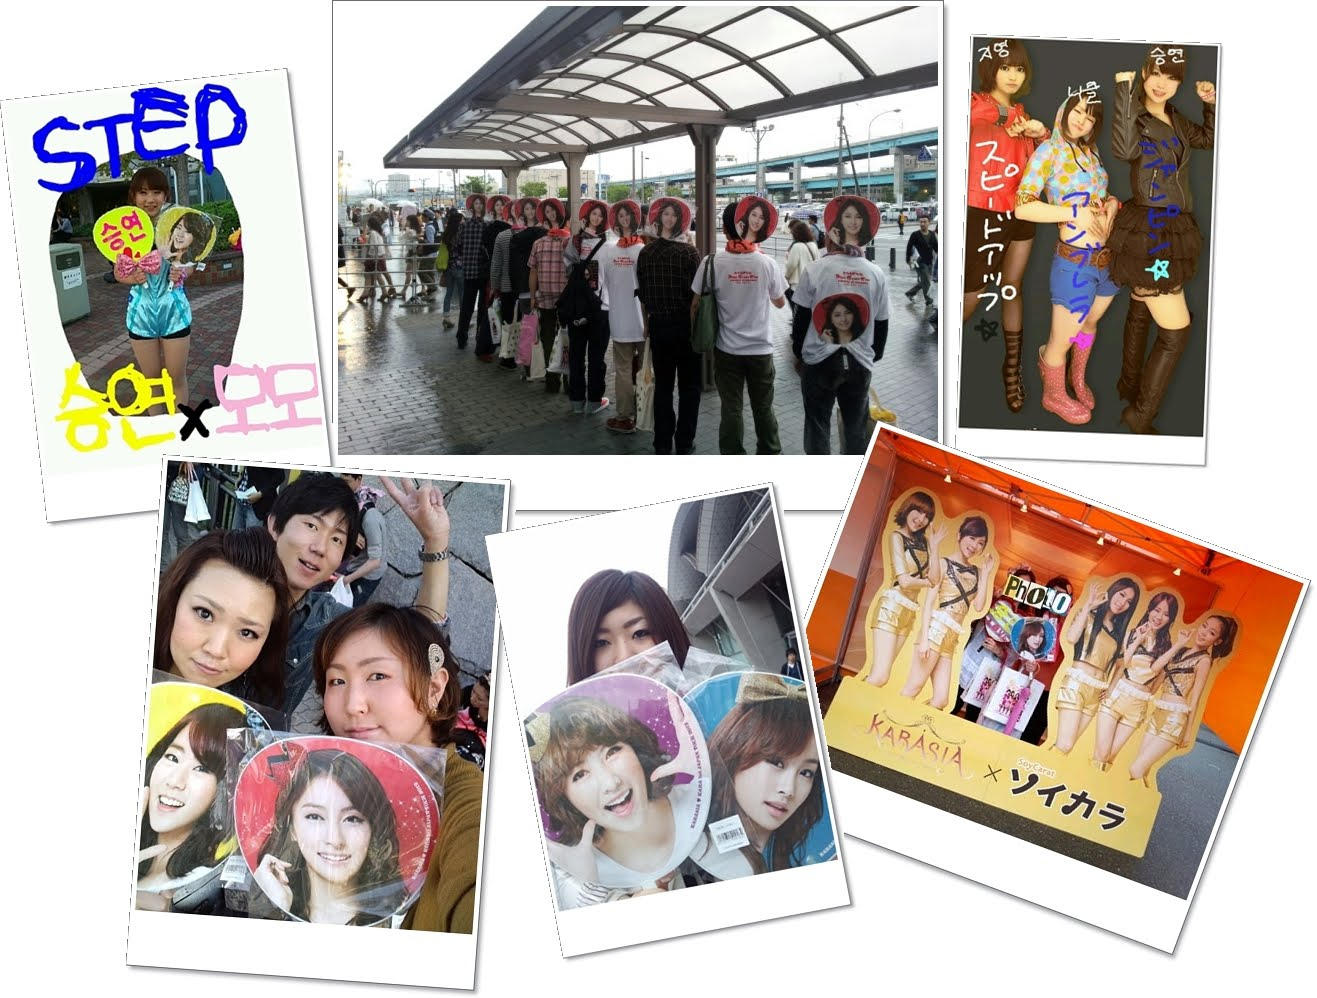 fukuoka.d2.fans.jpg